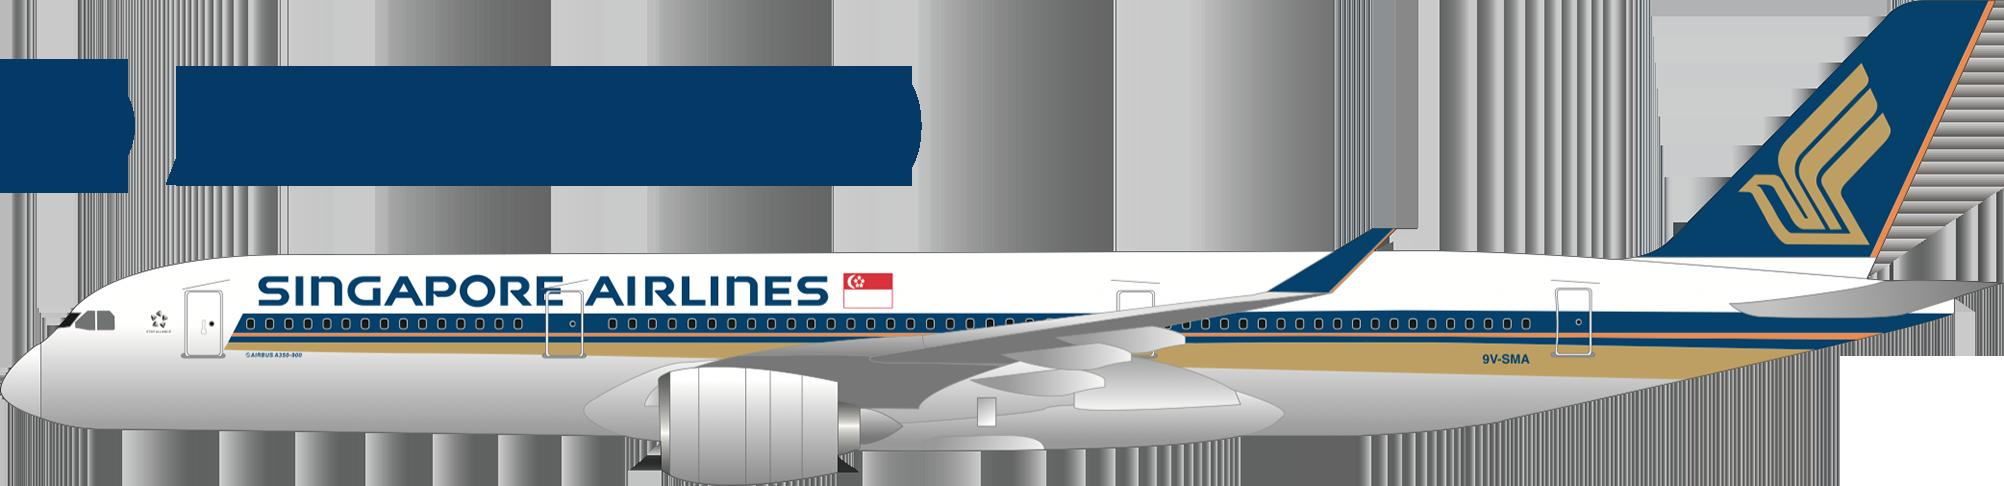 !A359 Label